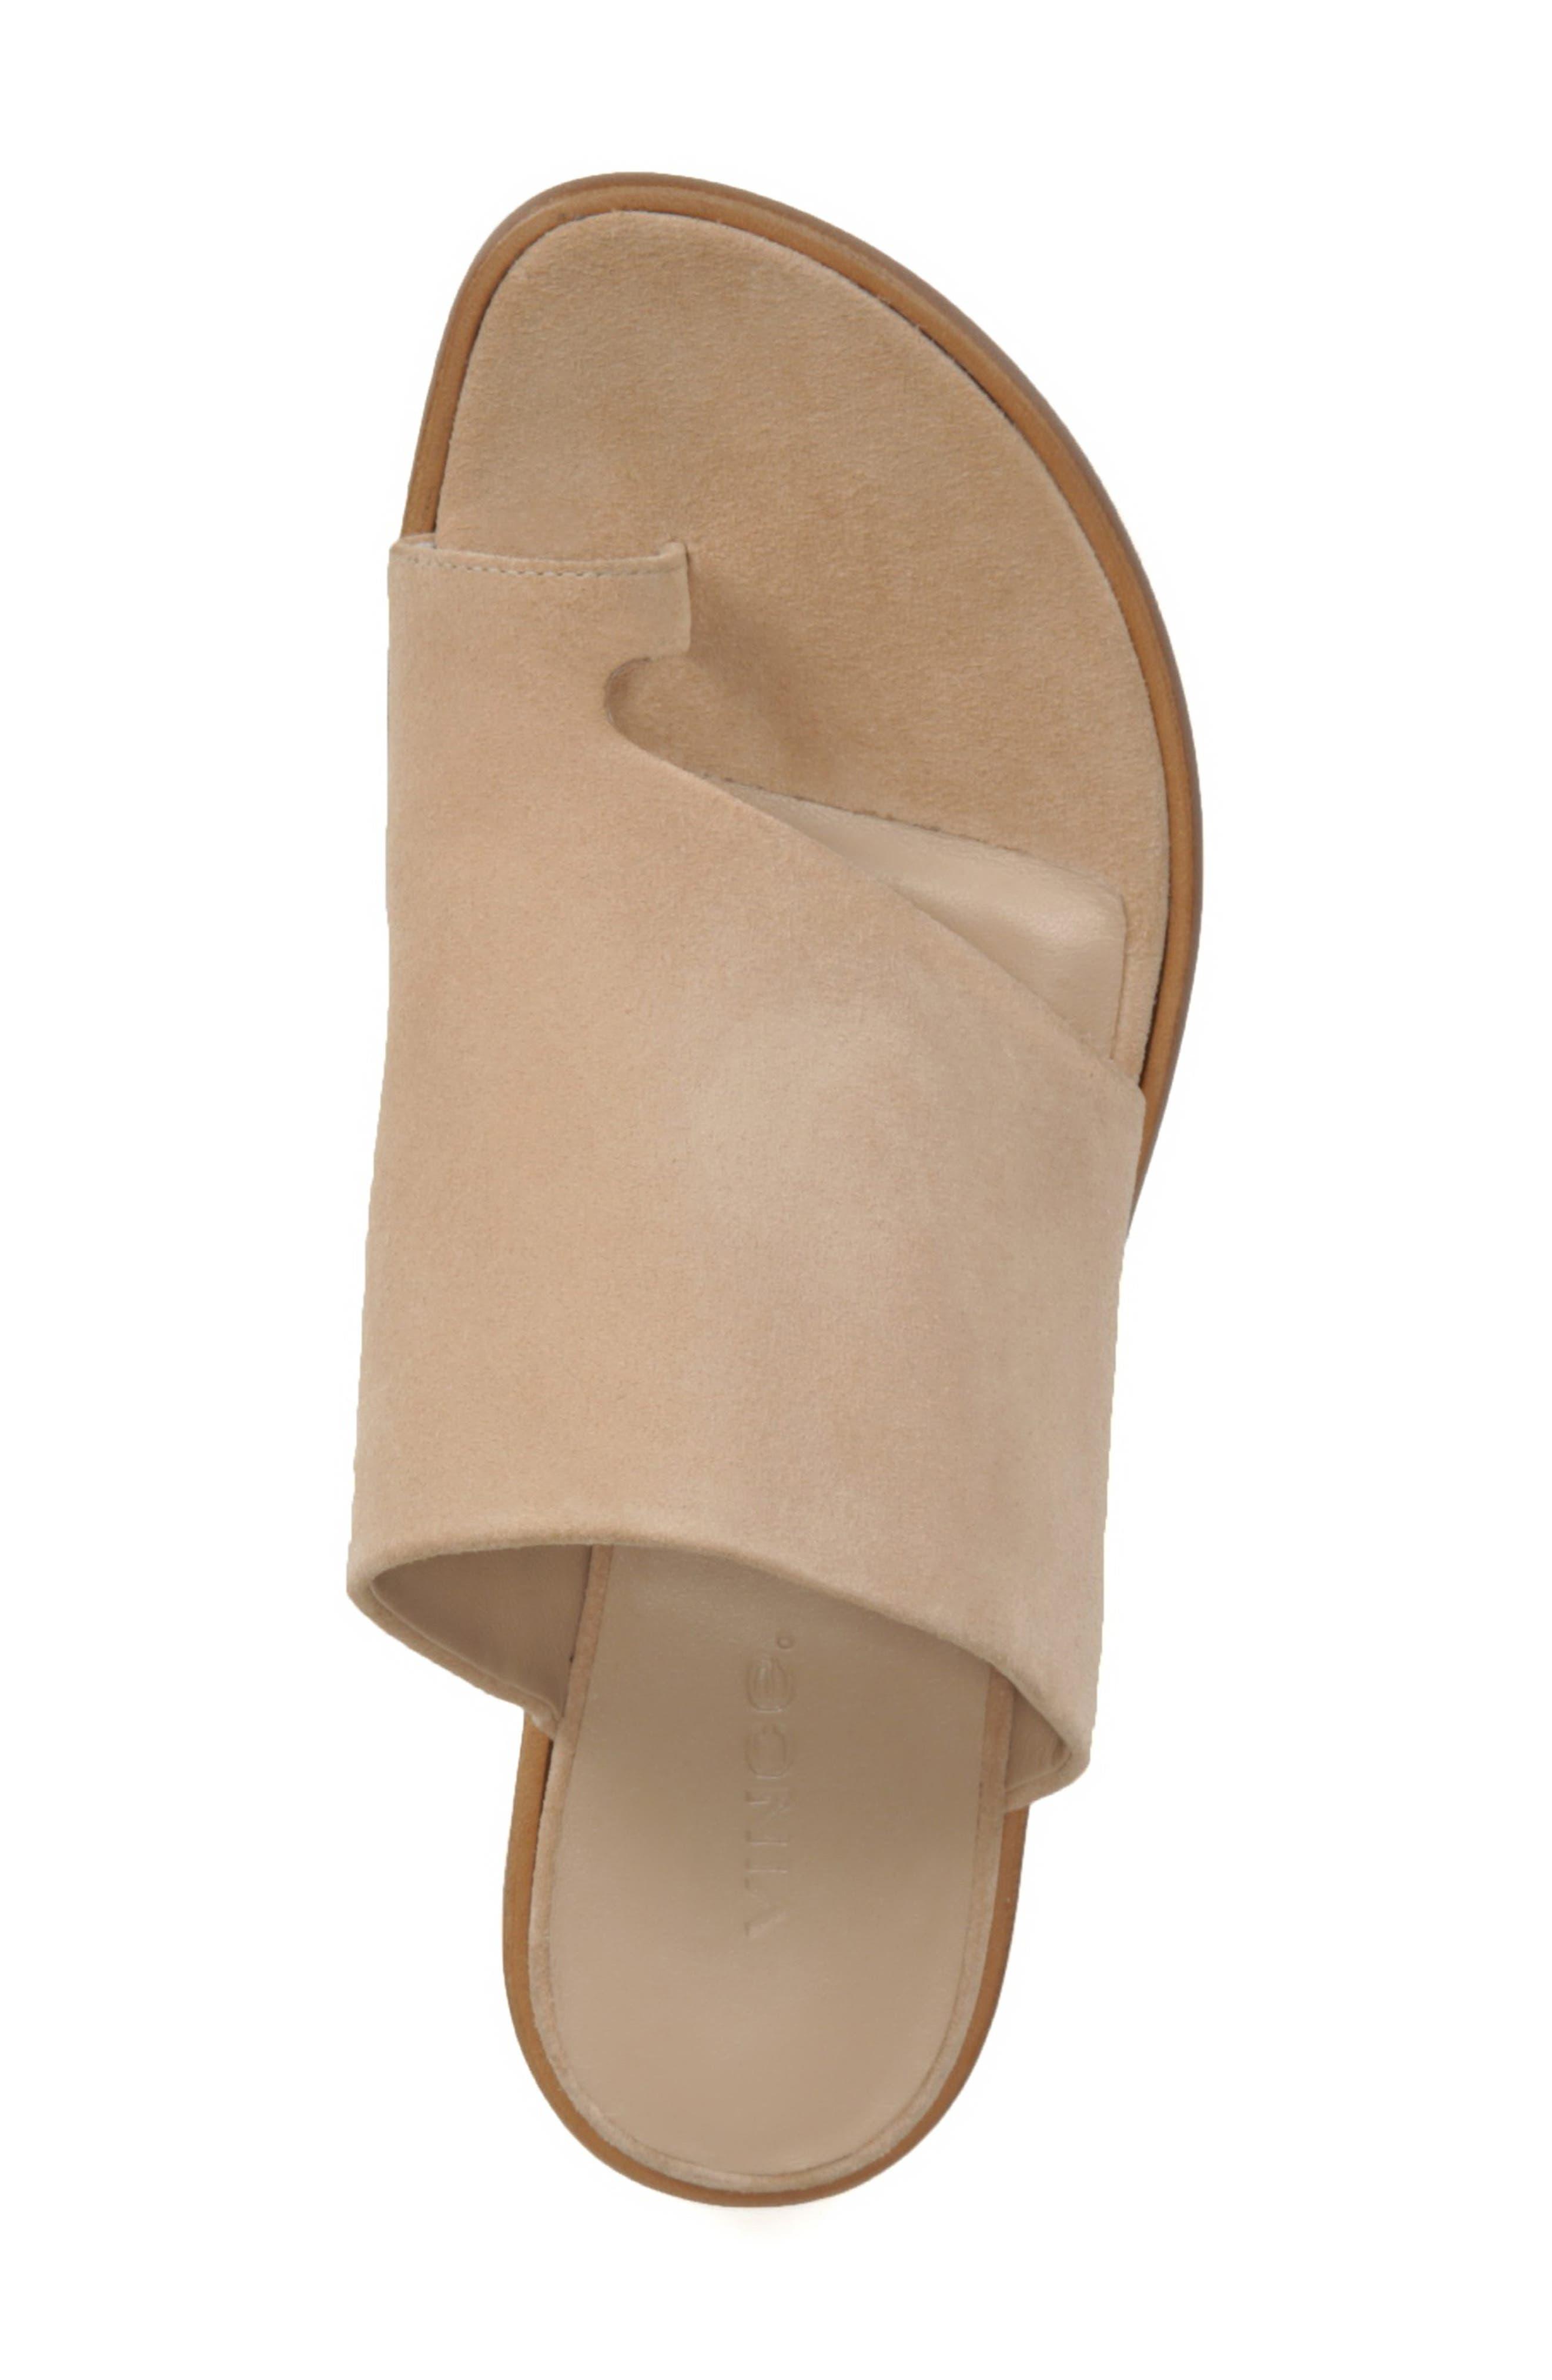 Edris Toe Loop Sandal,                             Alternate thumbnail 5, color,                             SAND